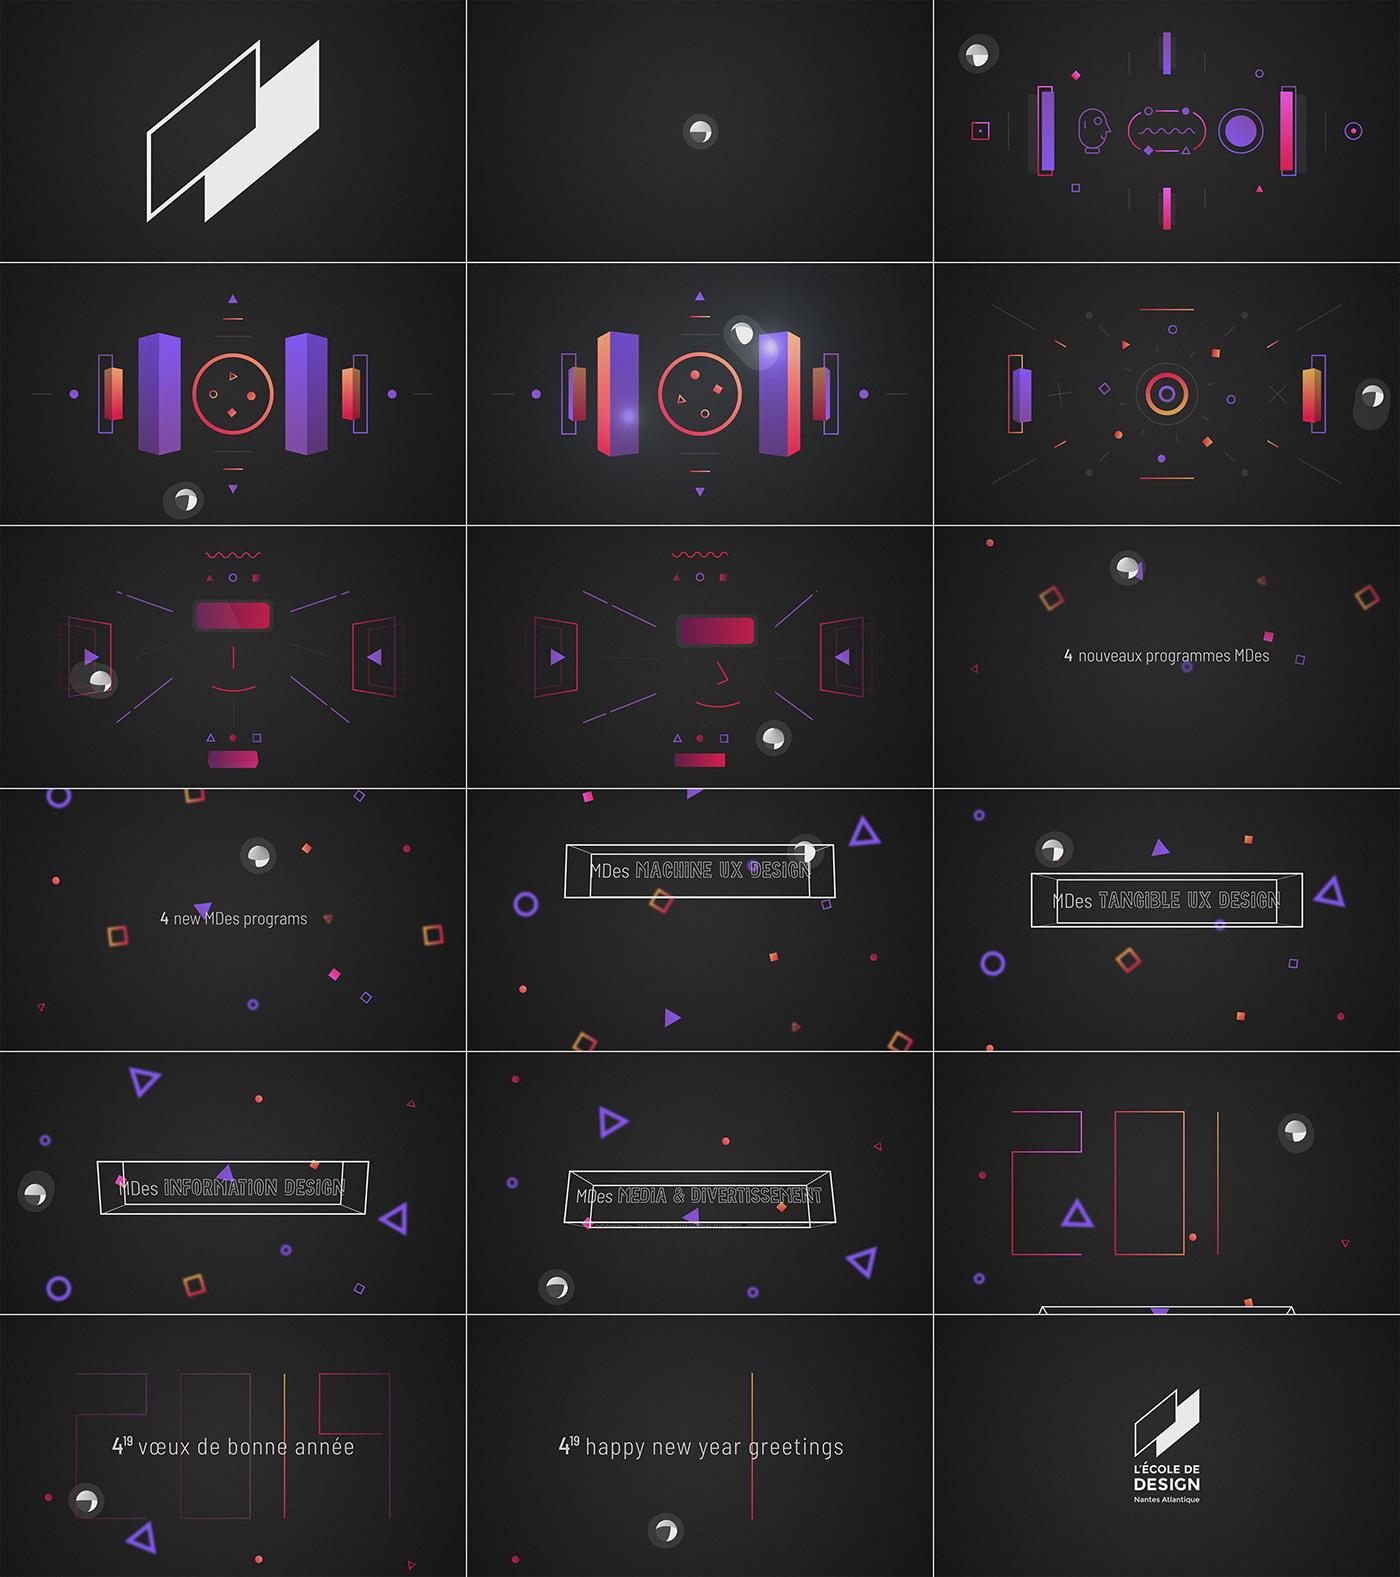 motion design animation  design wishes voeux